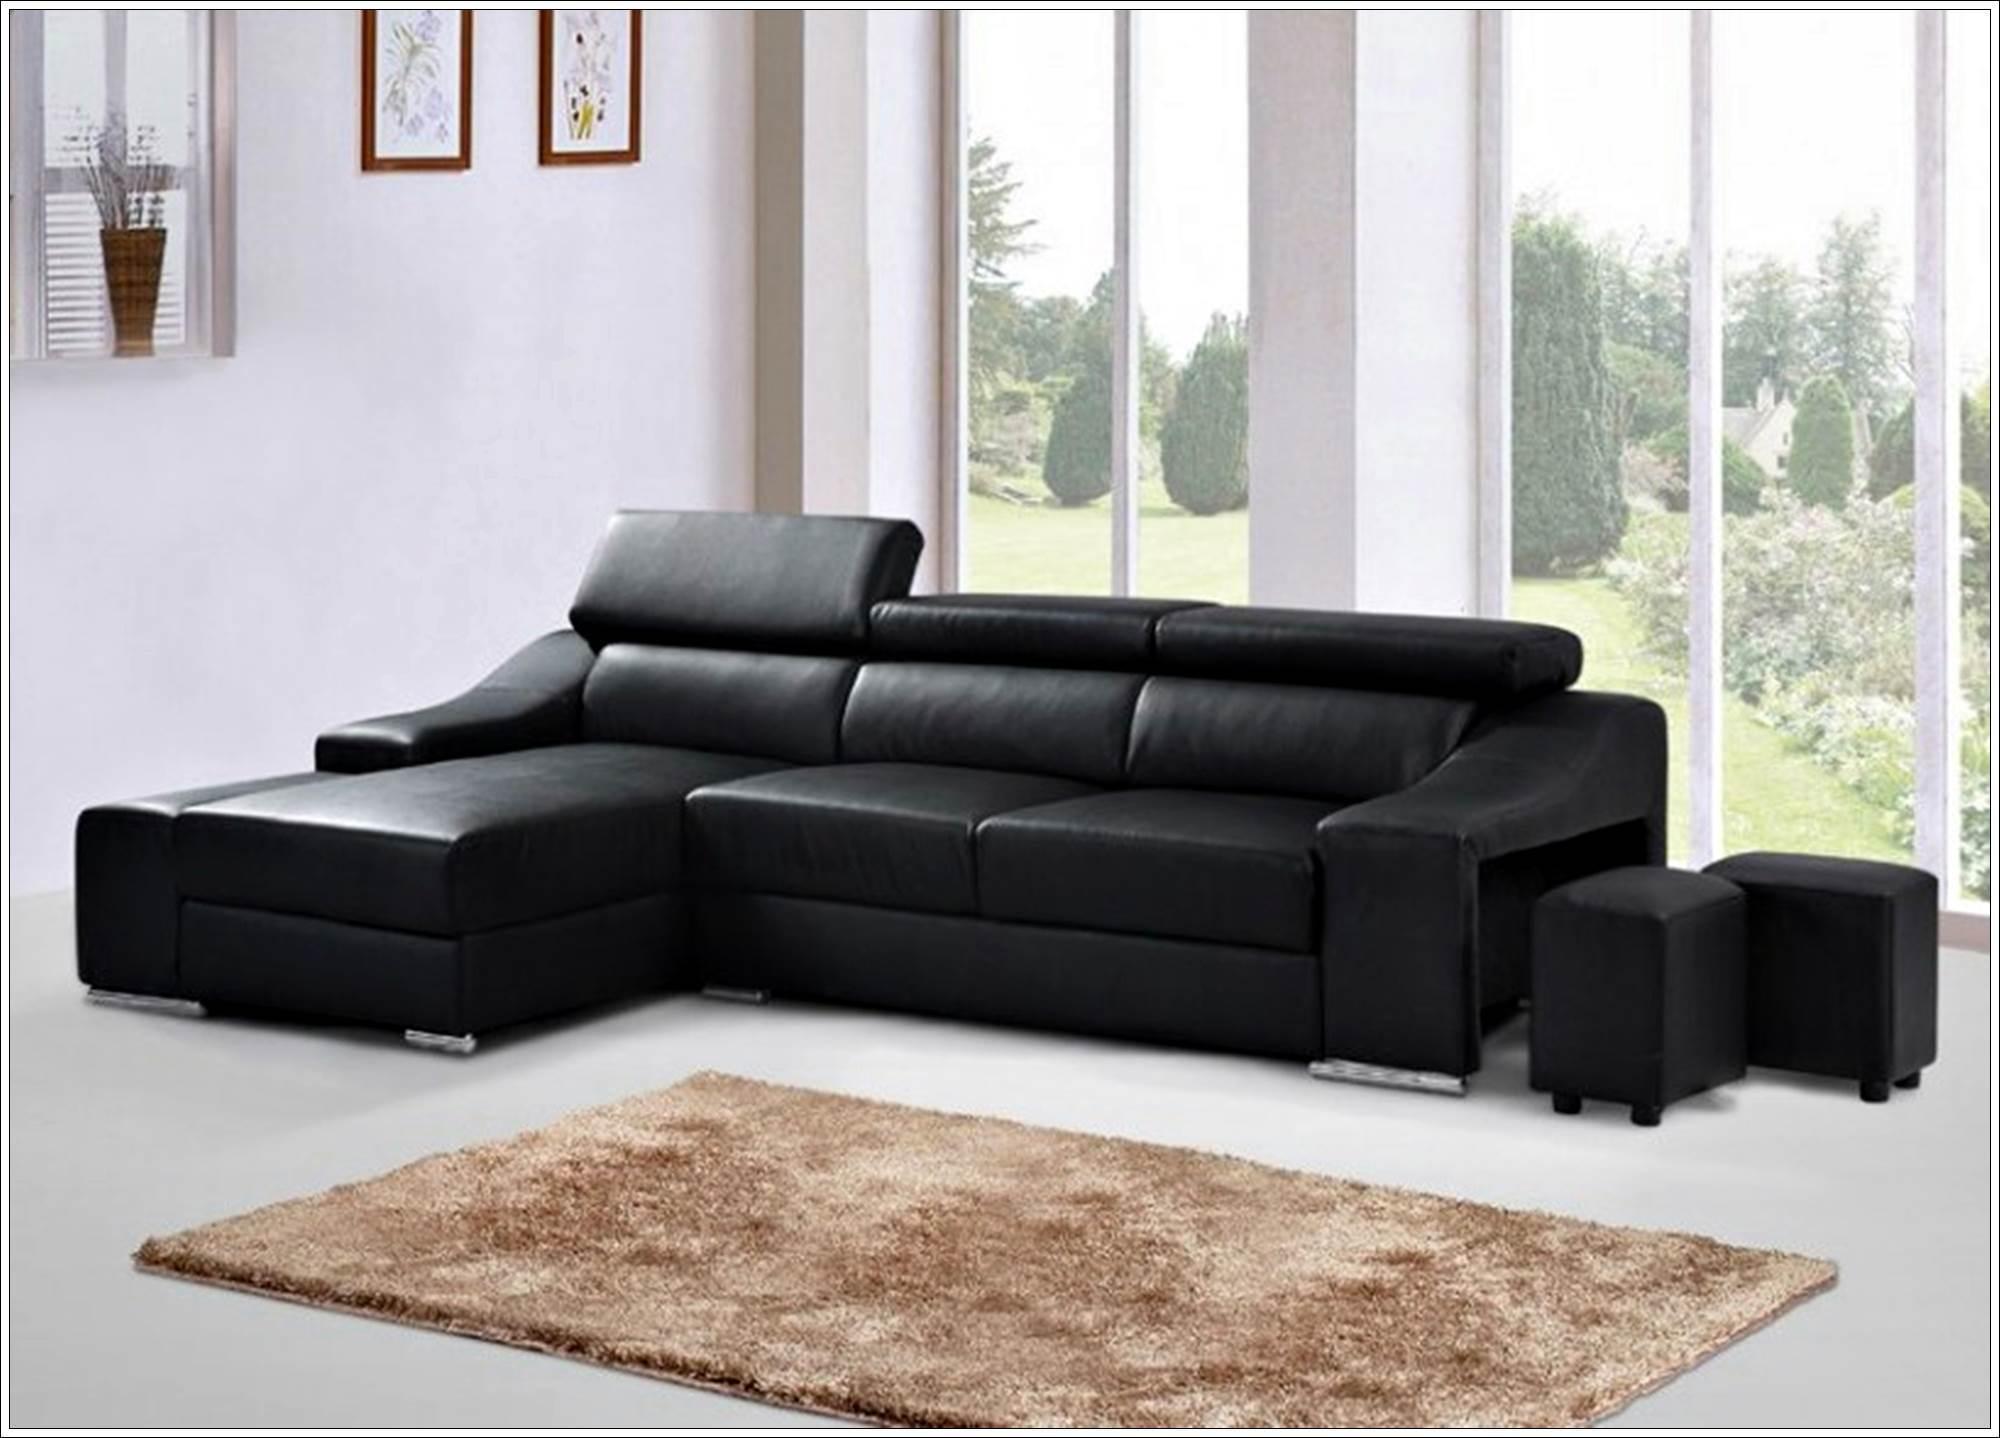 canap maison du monde convertible inspirant images canap. Black Bedroom Furniture Sets. Home Design Ideas